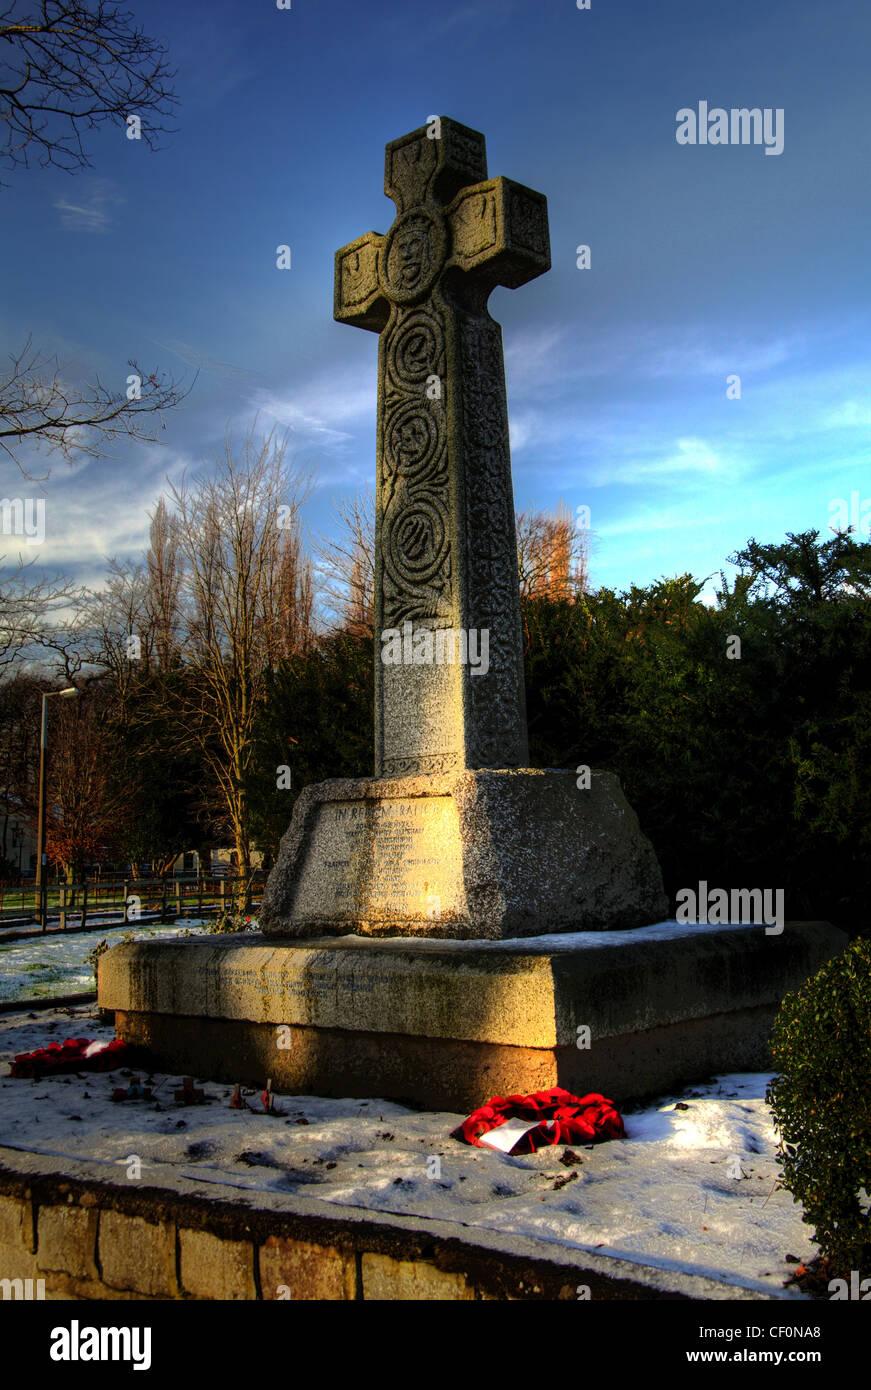 Laden Sie dieses Alamy Stockfoto Der Kenotaph War Memorial, Bell Lane, Thelwalls, Warrington, Cheshire, England, GB - CF0NA8